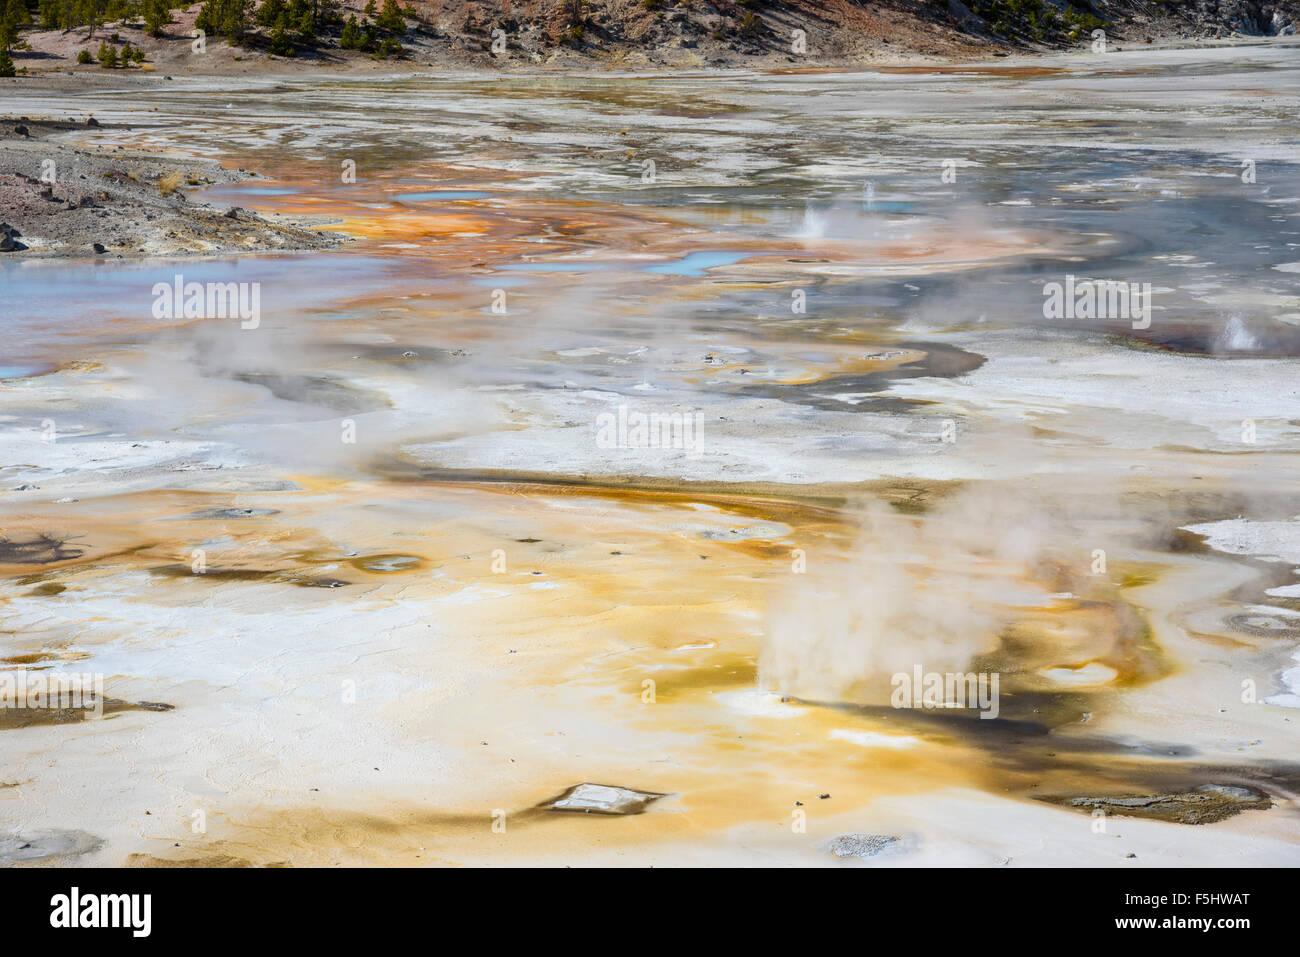 Ressorts de porcelaine, Norris Geyser Basin, Parc National de Yellowstone, Wyoming, USA Photo Stock